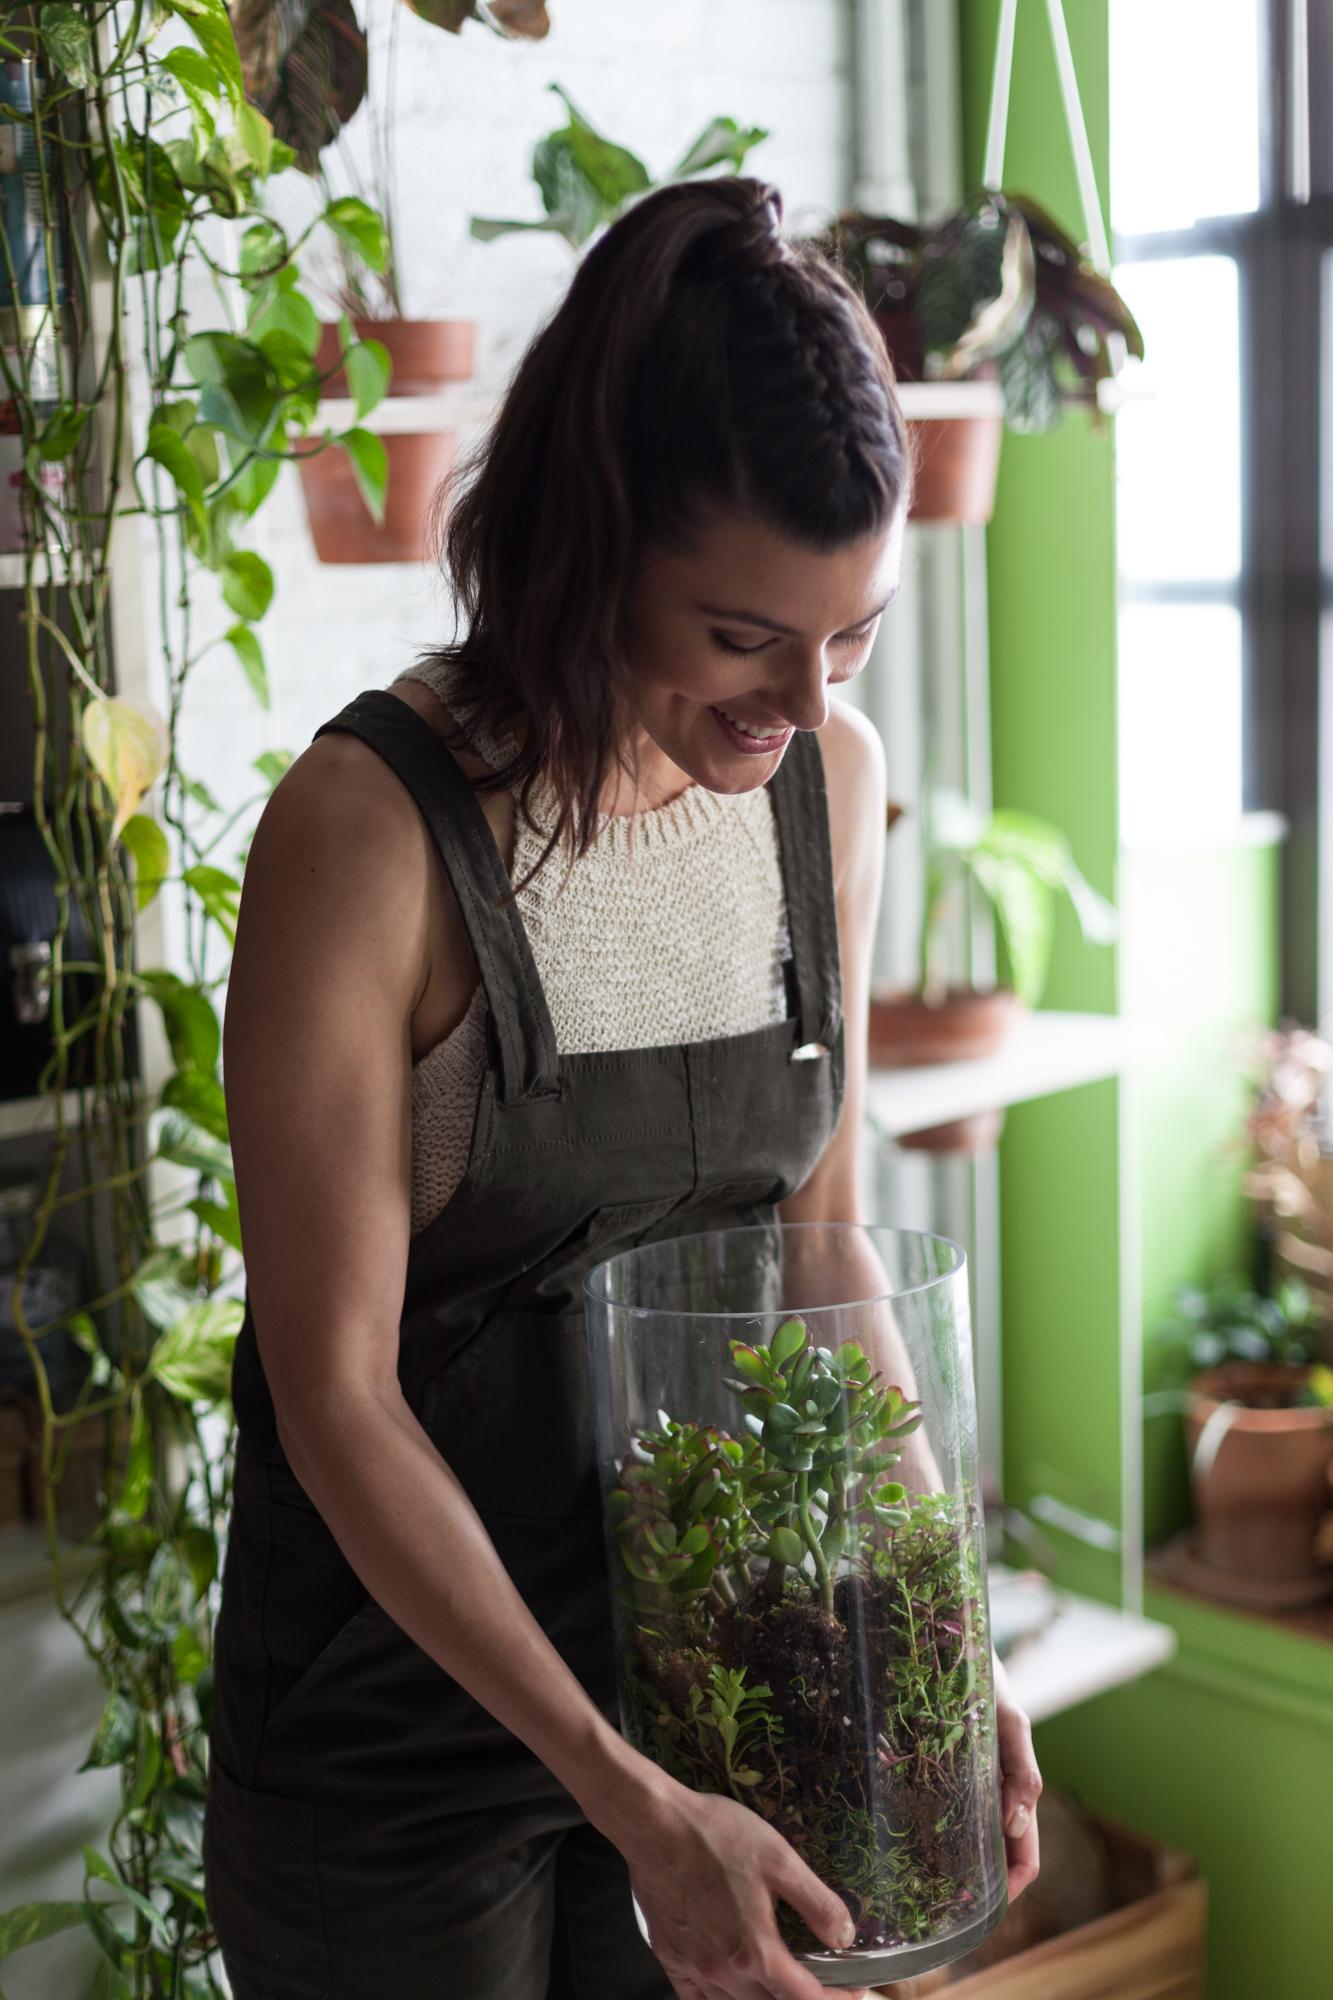 Summer-Rayne-Oakes_houseplants_Well+Good.jpg